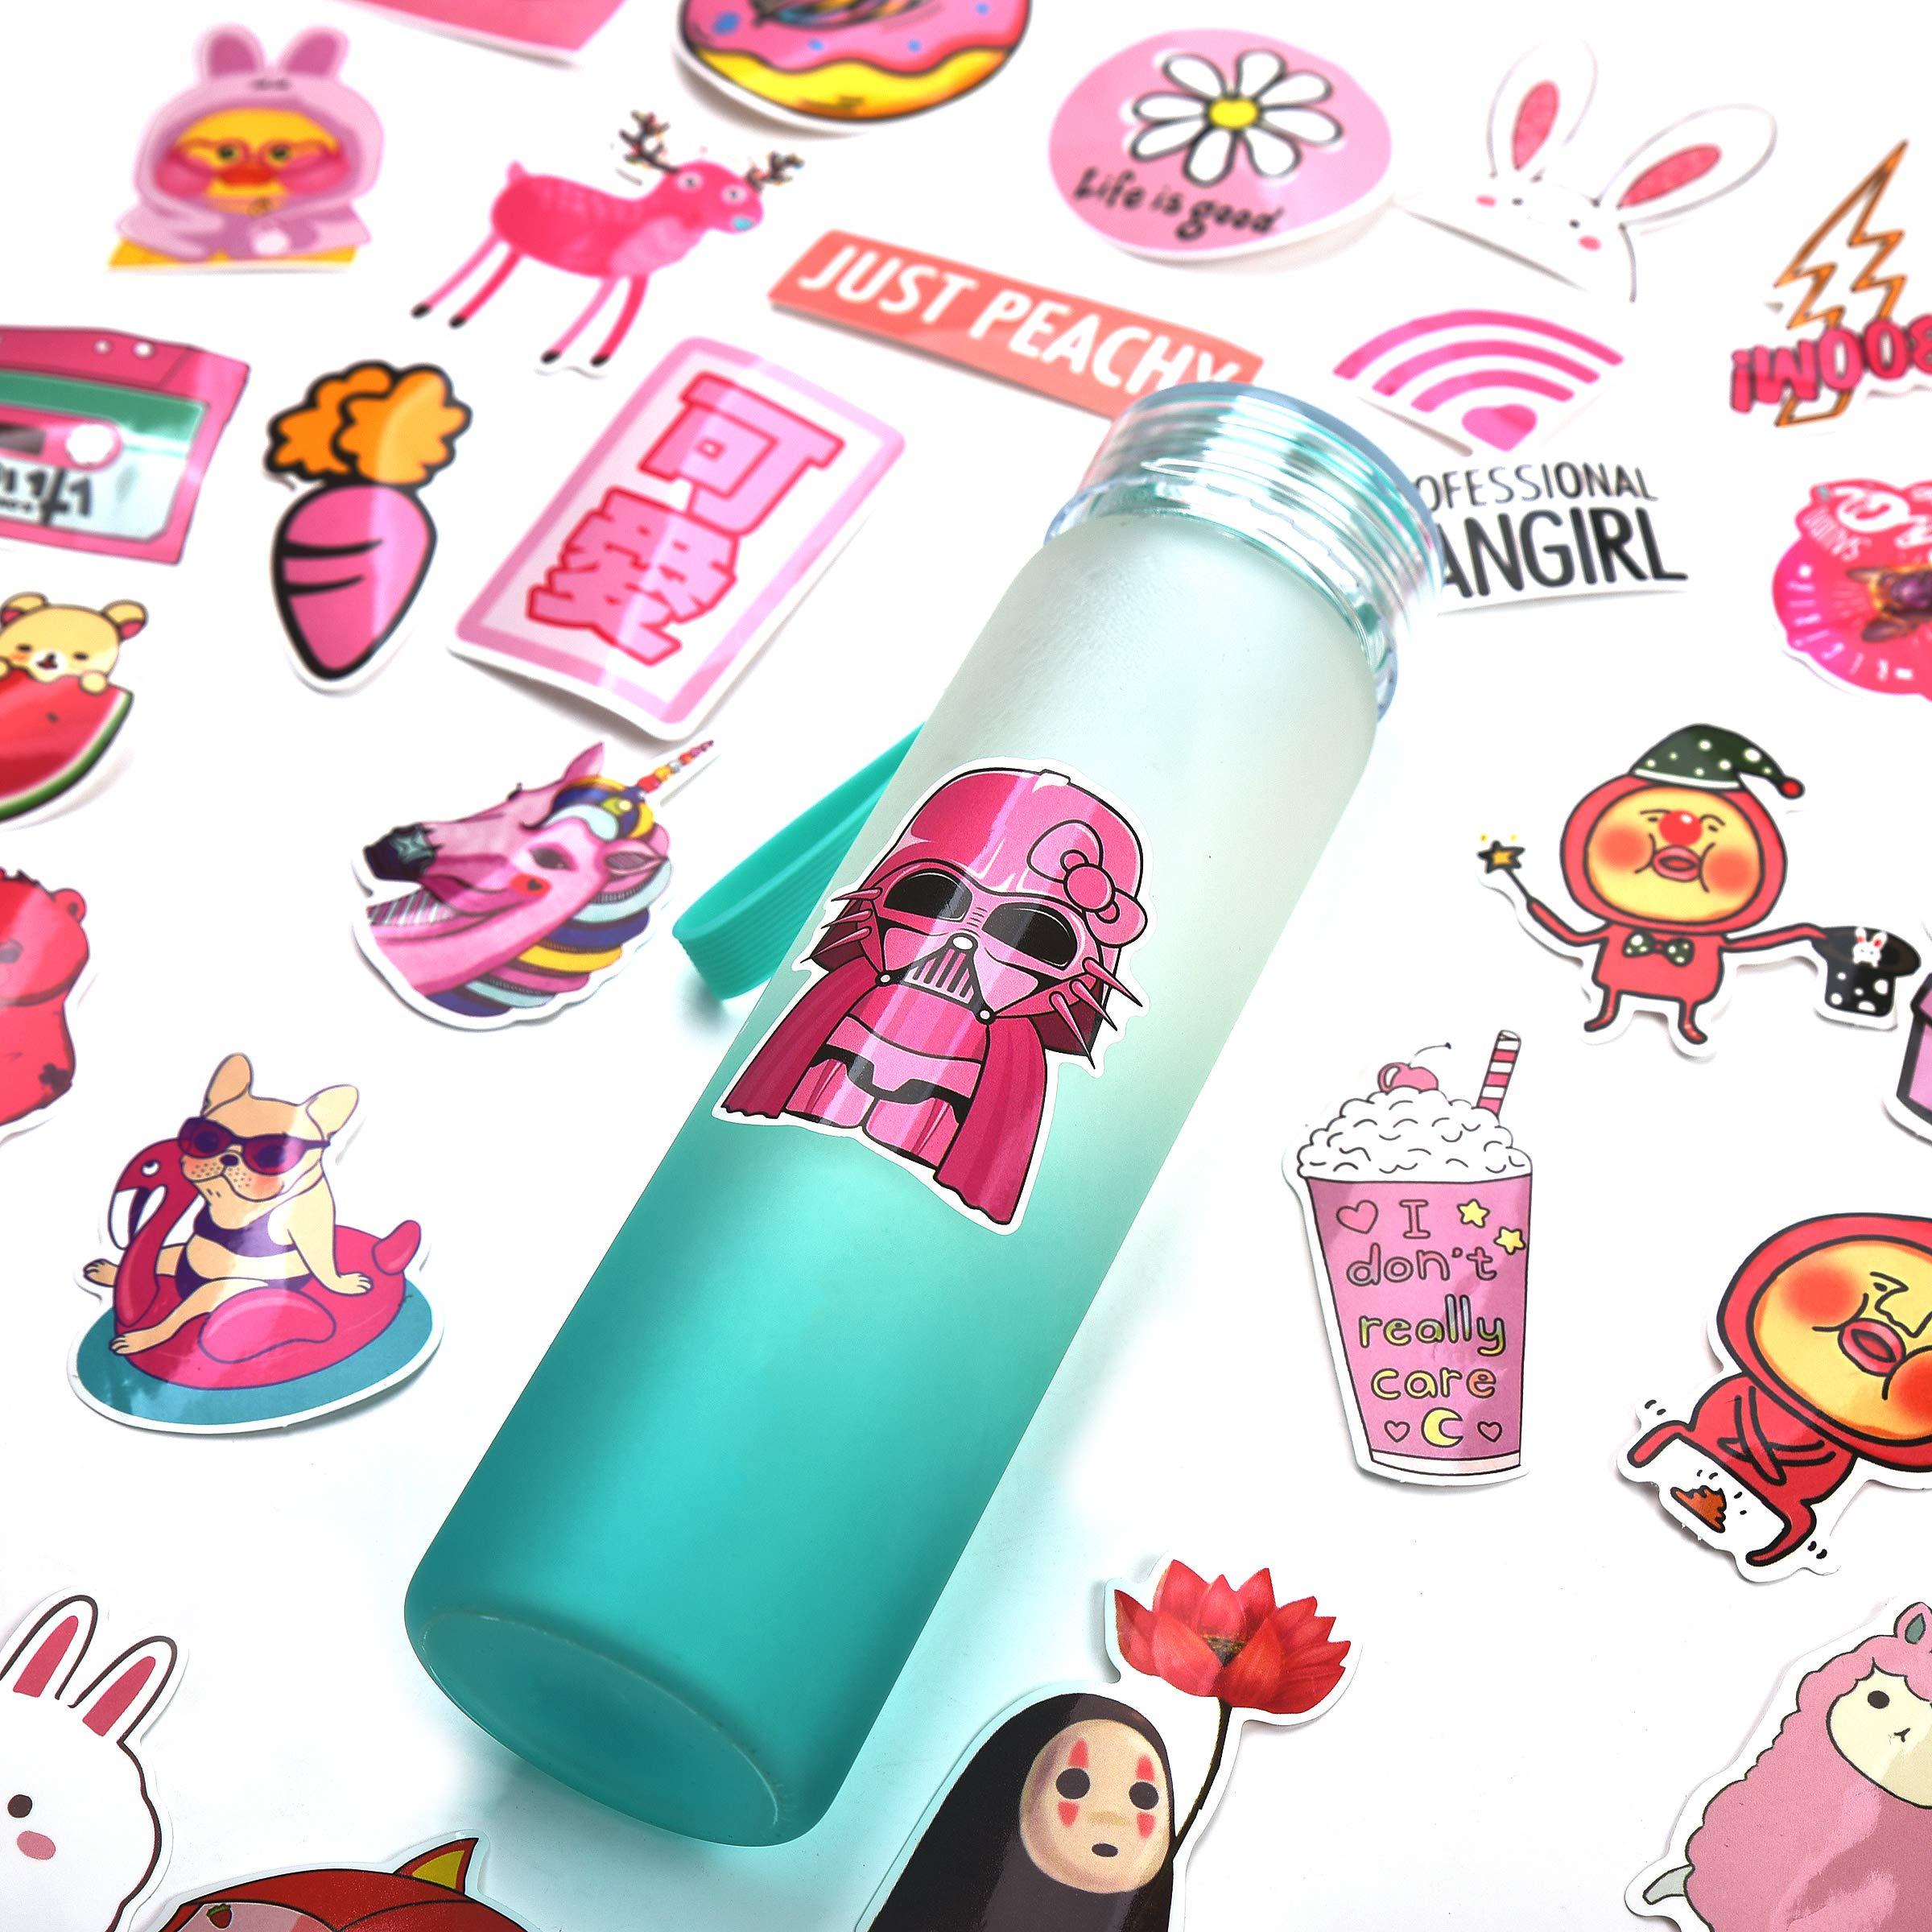 Mizzuco Vinyl Stickers Waterproof Cute Stickers 50 Pieces for Laptop Bumper Helmet Ipad Car Luggage Water Bottle (FS126)